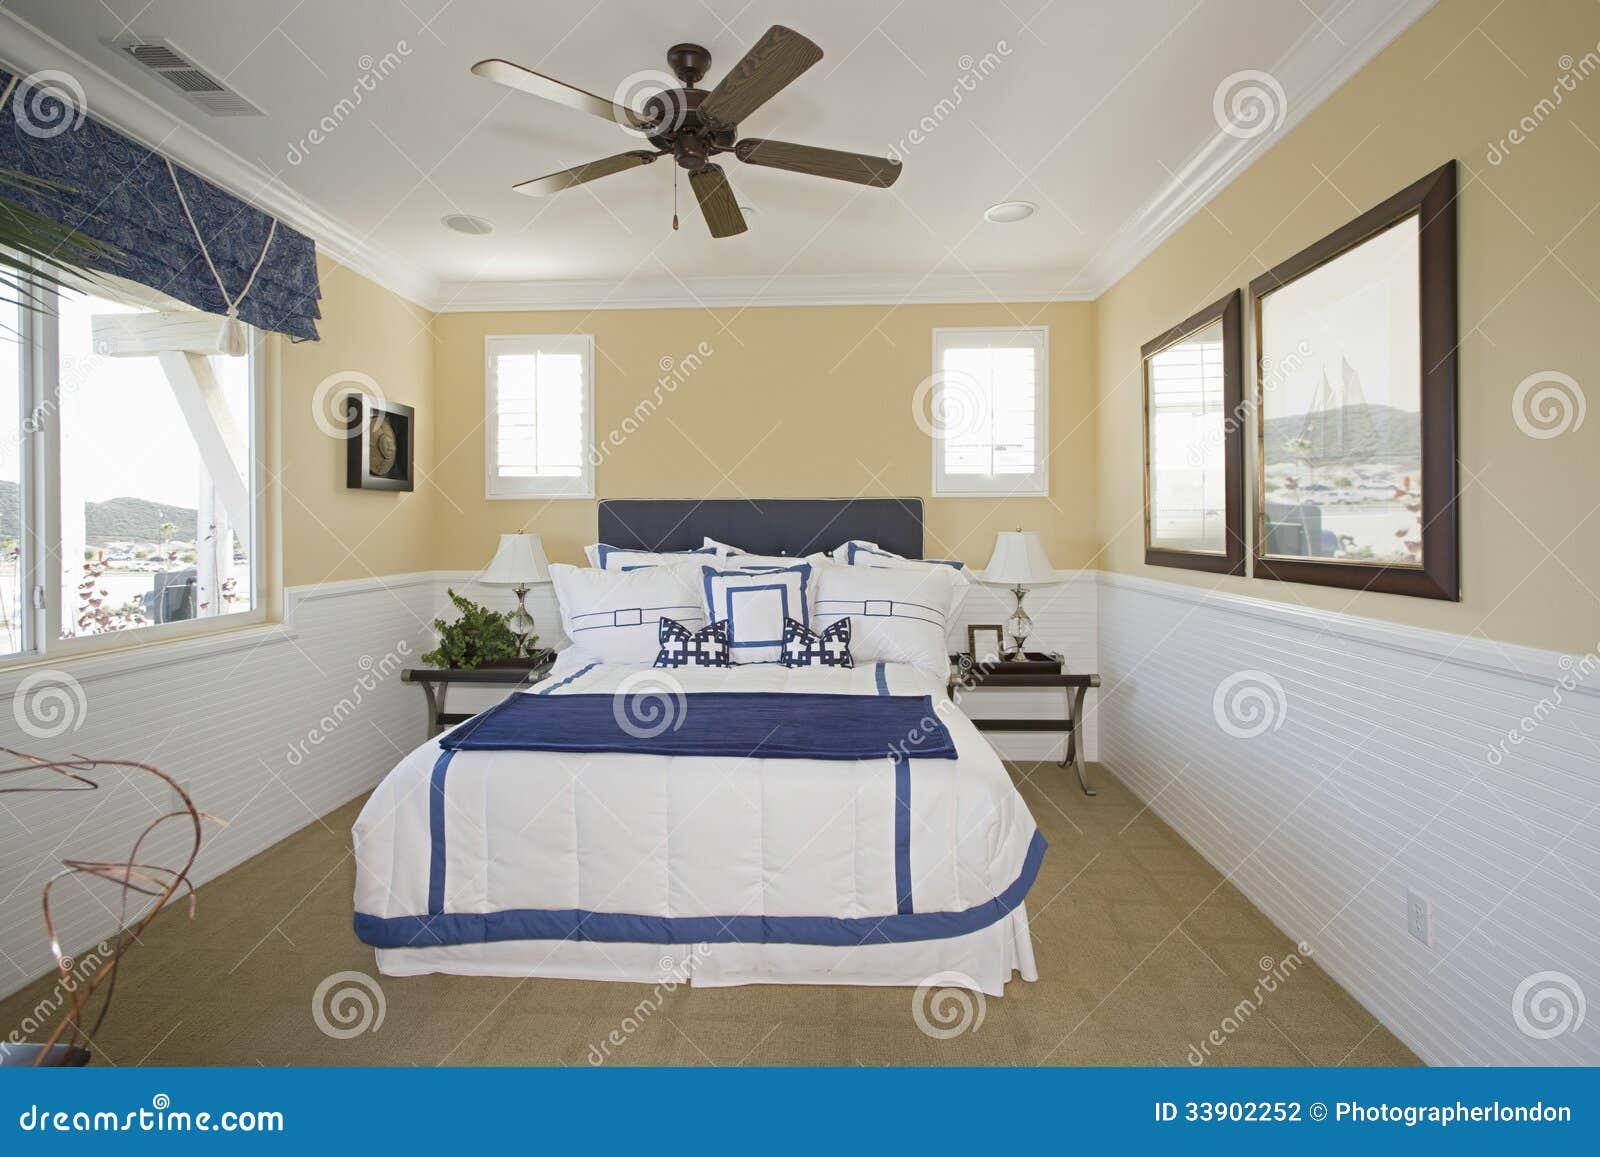 Nautical Themed Bedroom Stock Photography - Image: 33902252